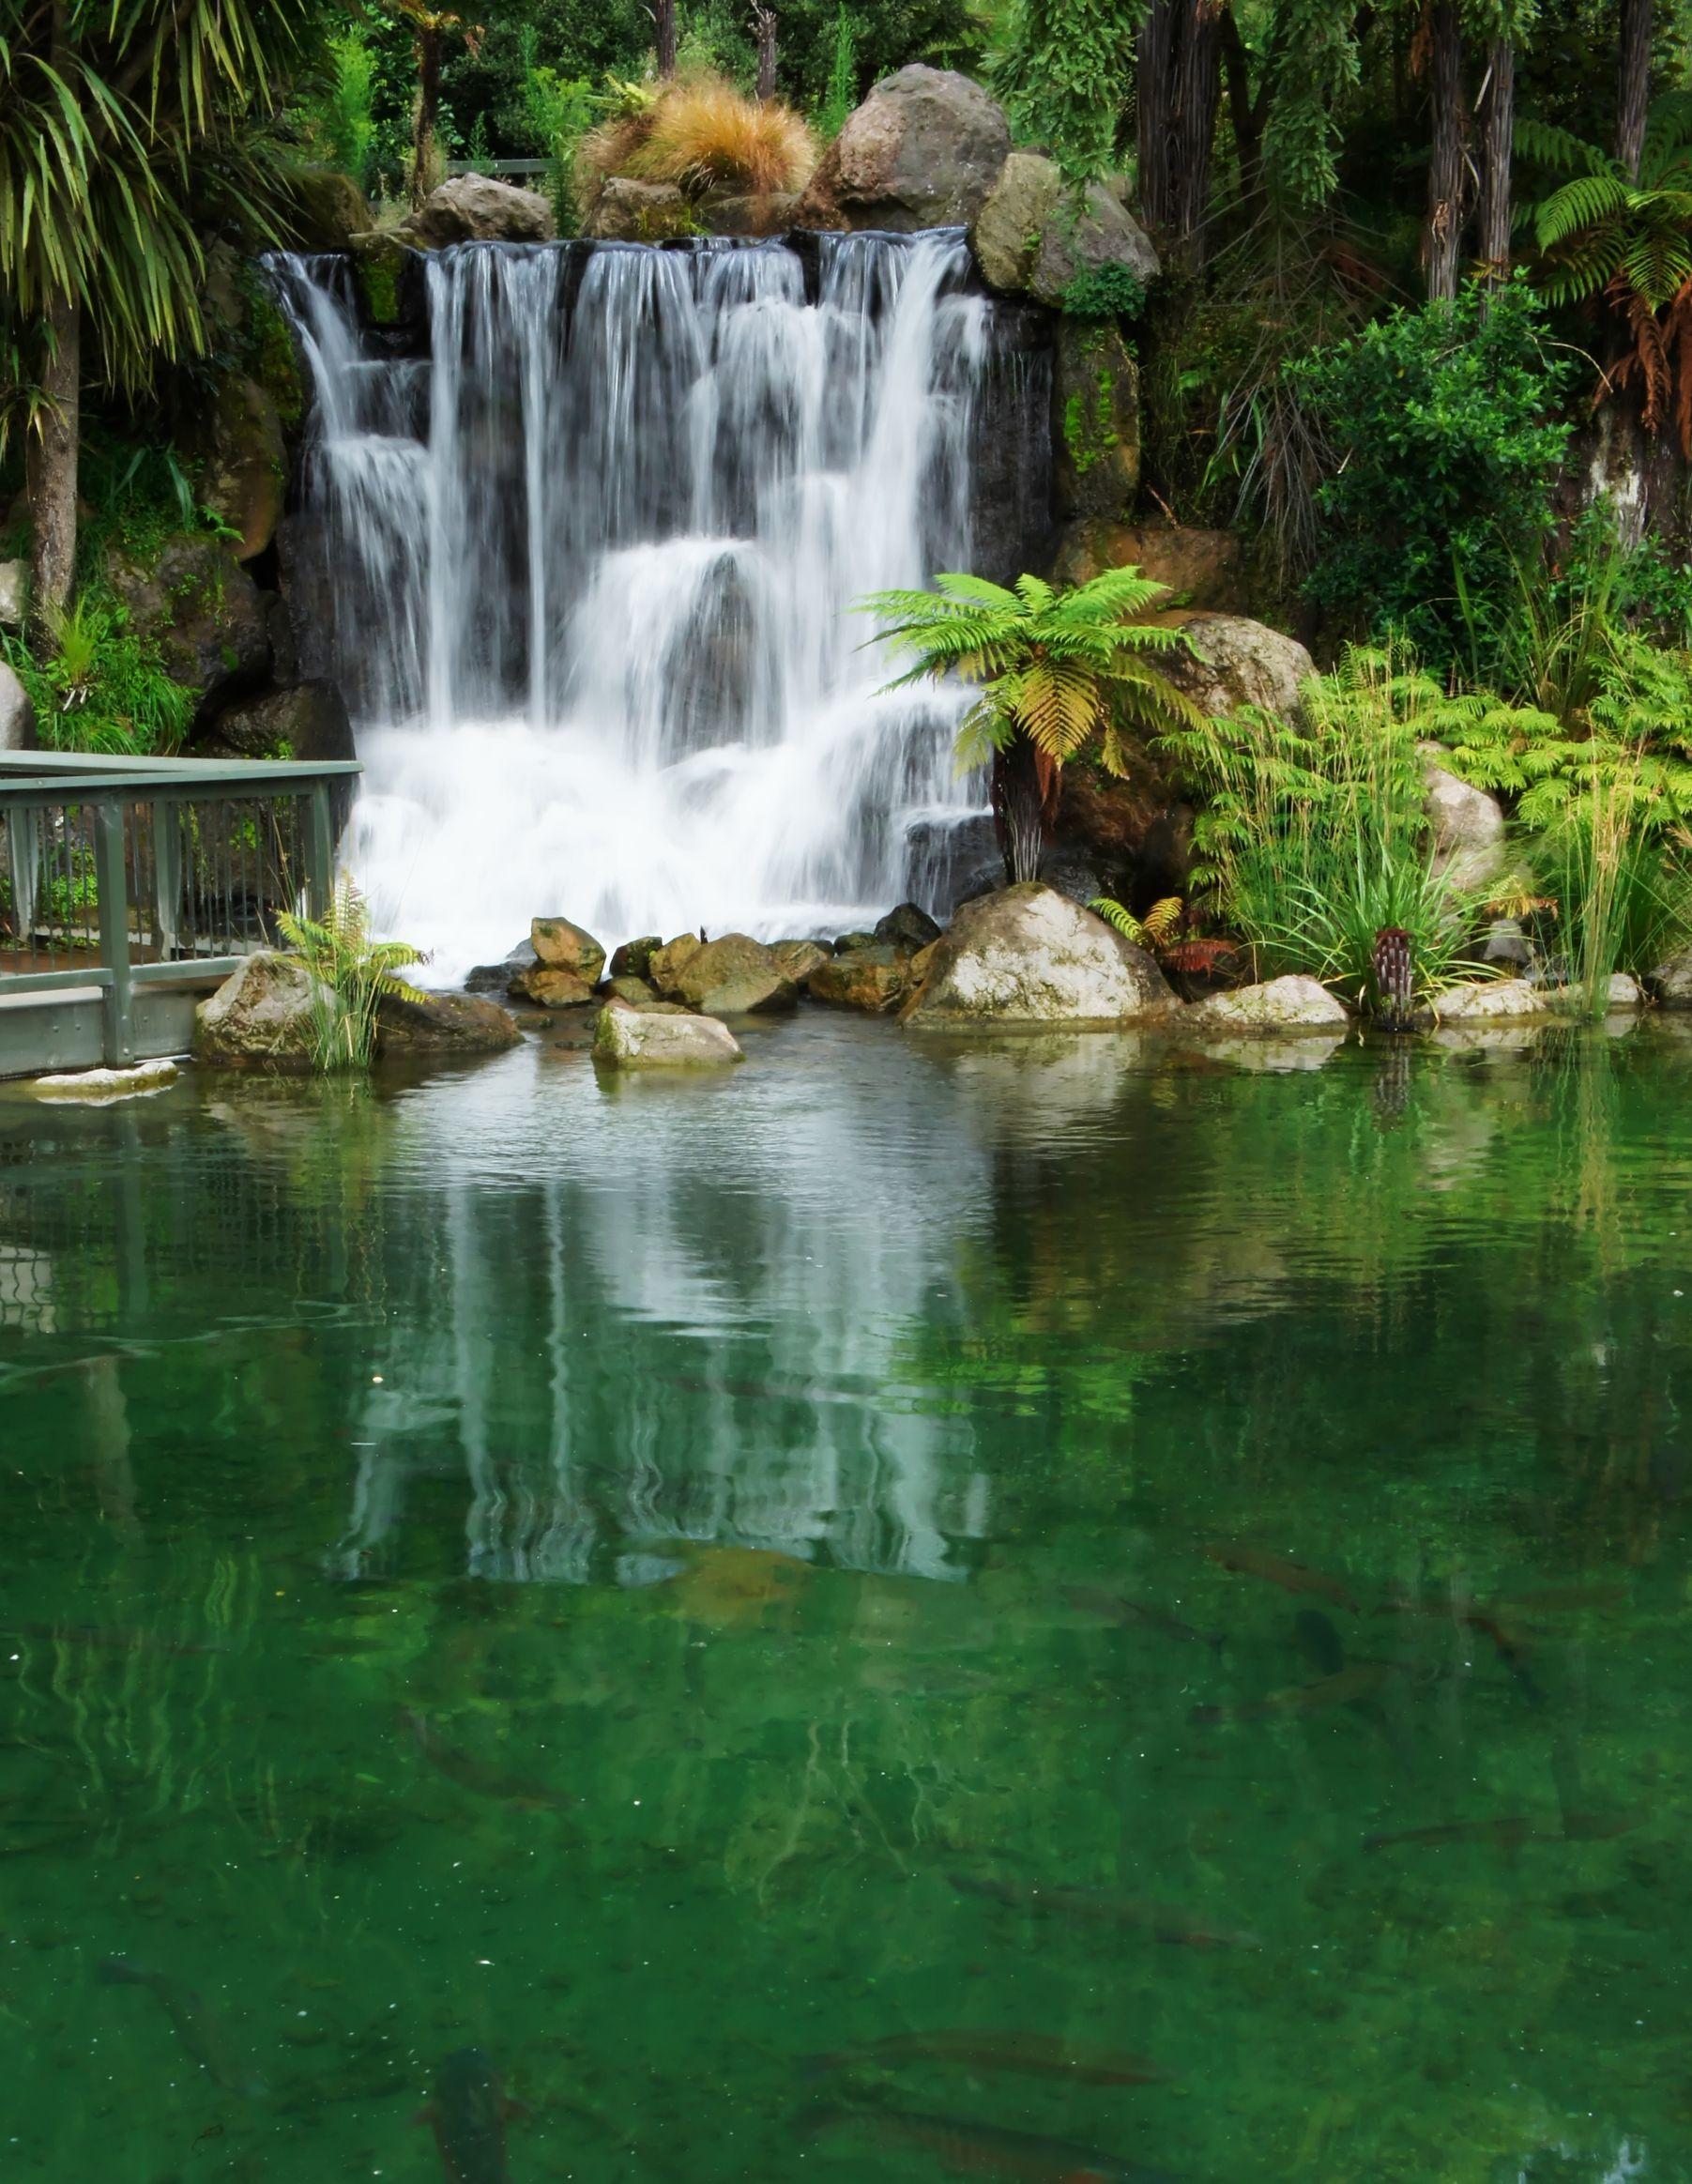 new zealand spring waterfall 123rf